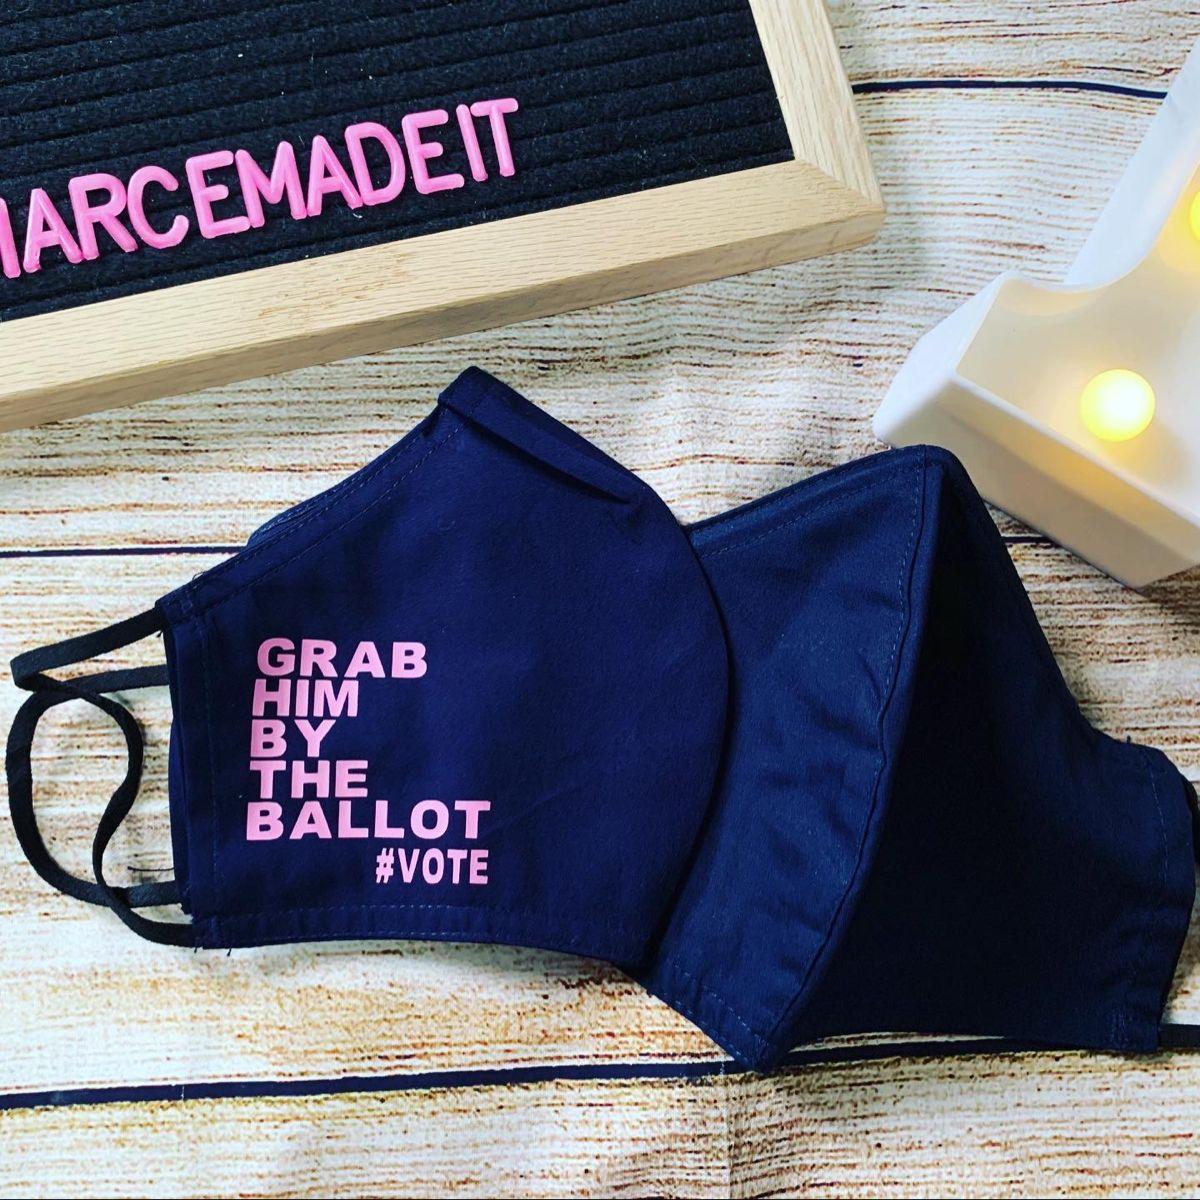 Grab Him By The Ballot Vote Biden Harris 2020 Face Mask In 2020 Etsy Shop Black Lives Matter Etsy Help